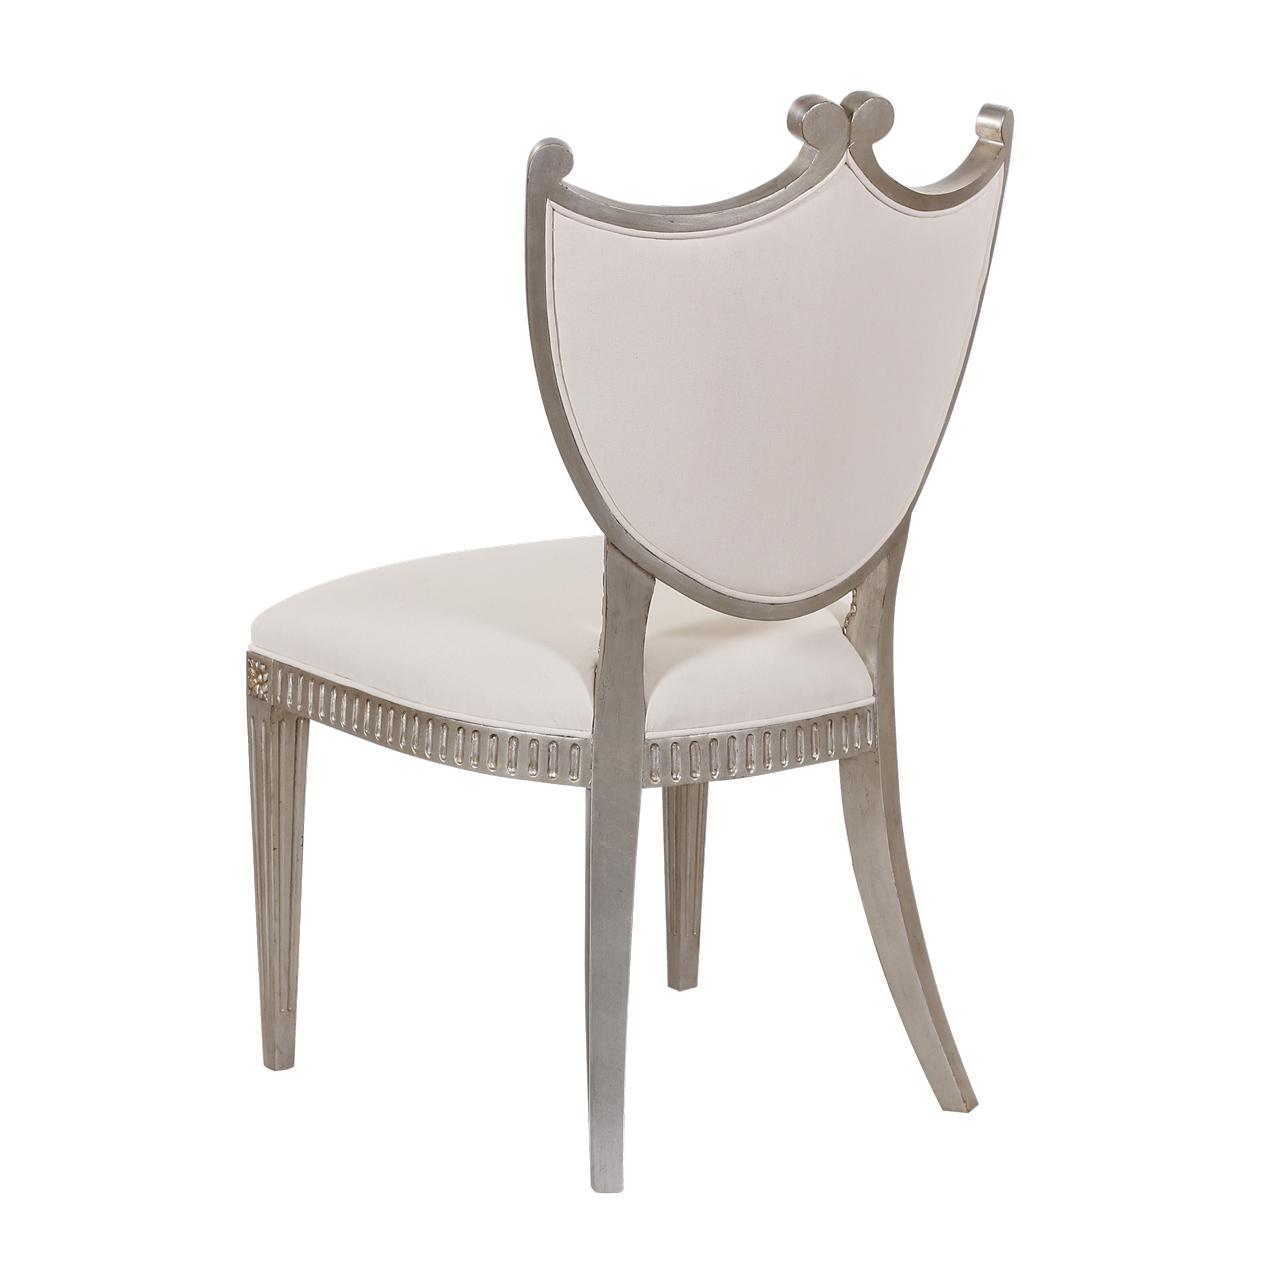 34597-2---Side-Chair-Hepplewhite-Shield-Back,-NF15-+-Cal--3